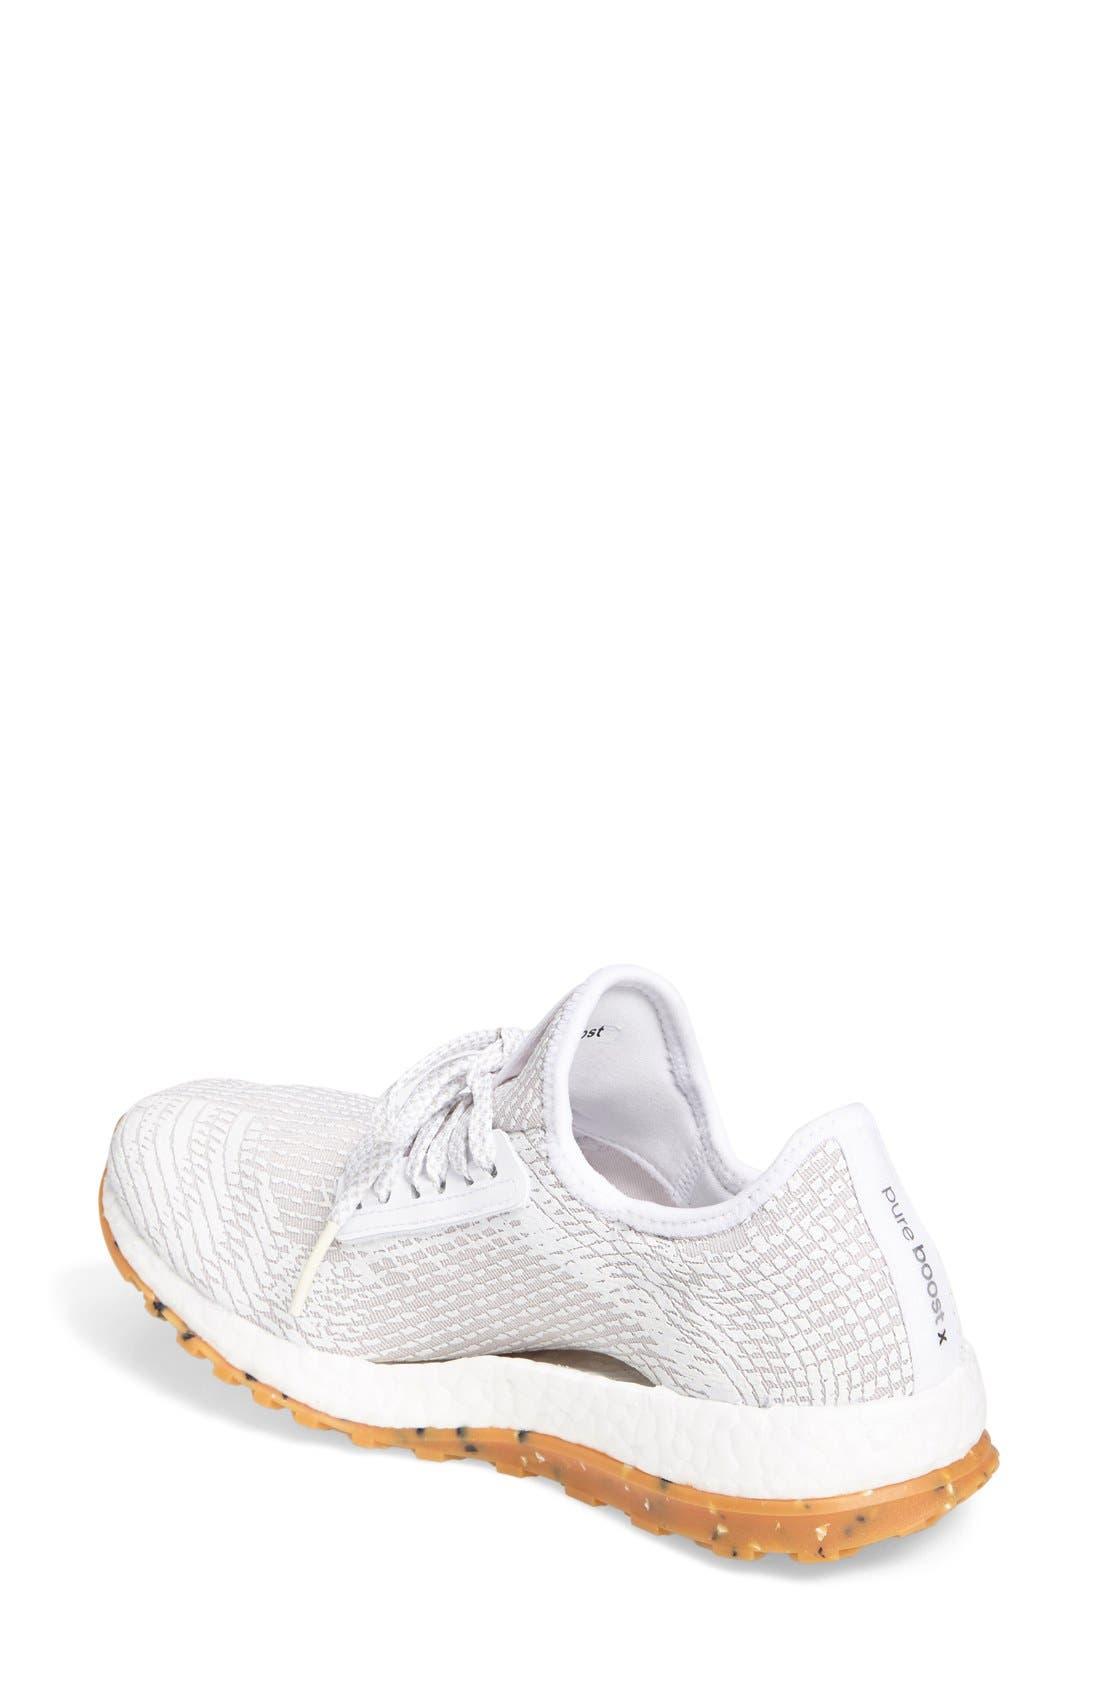 PureBoost X ATR Running Shoe,                             Alternate thumbnail 30, color,